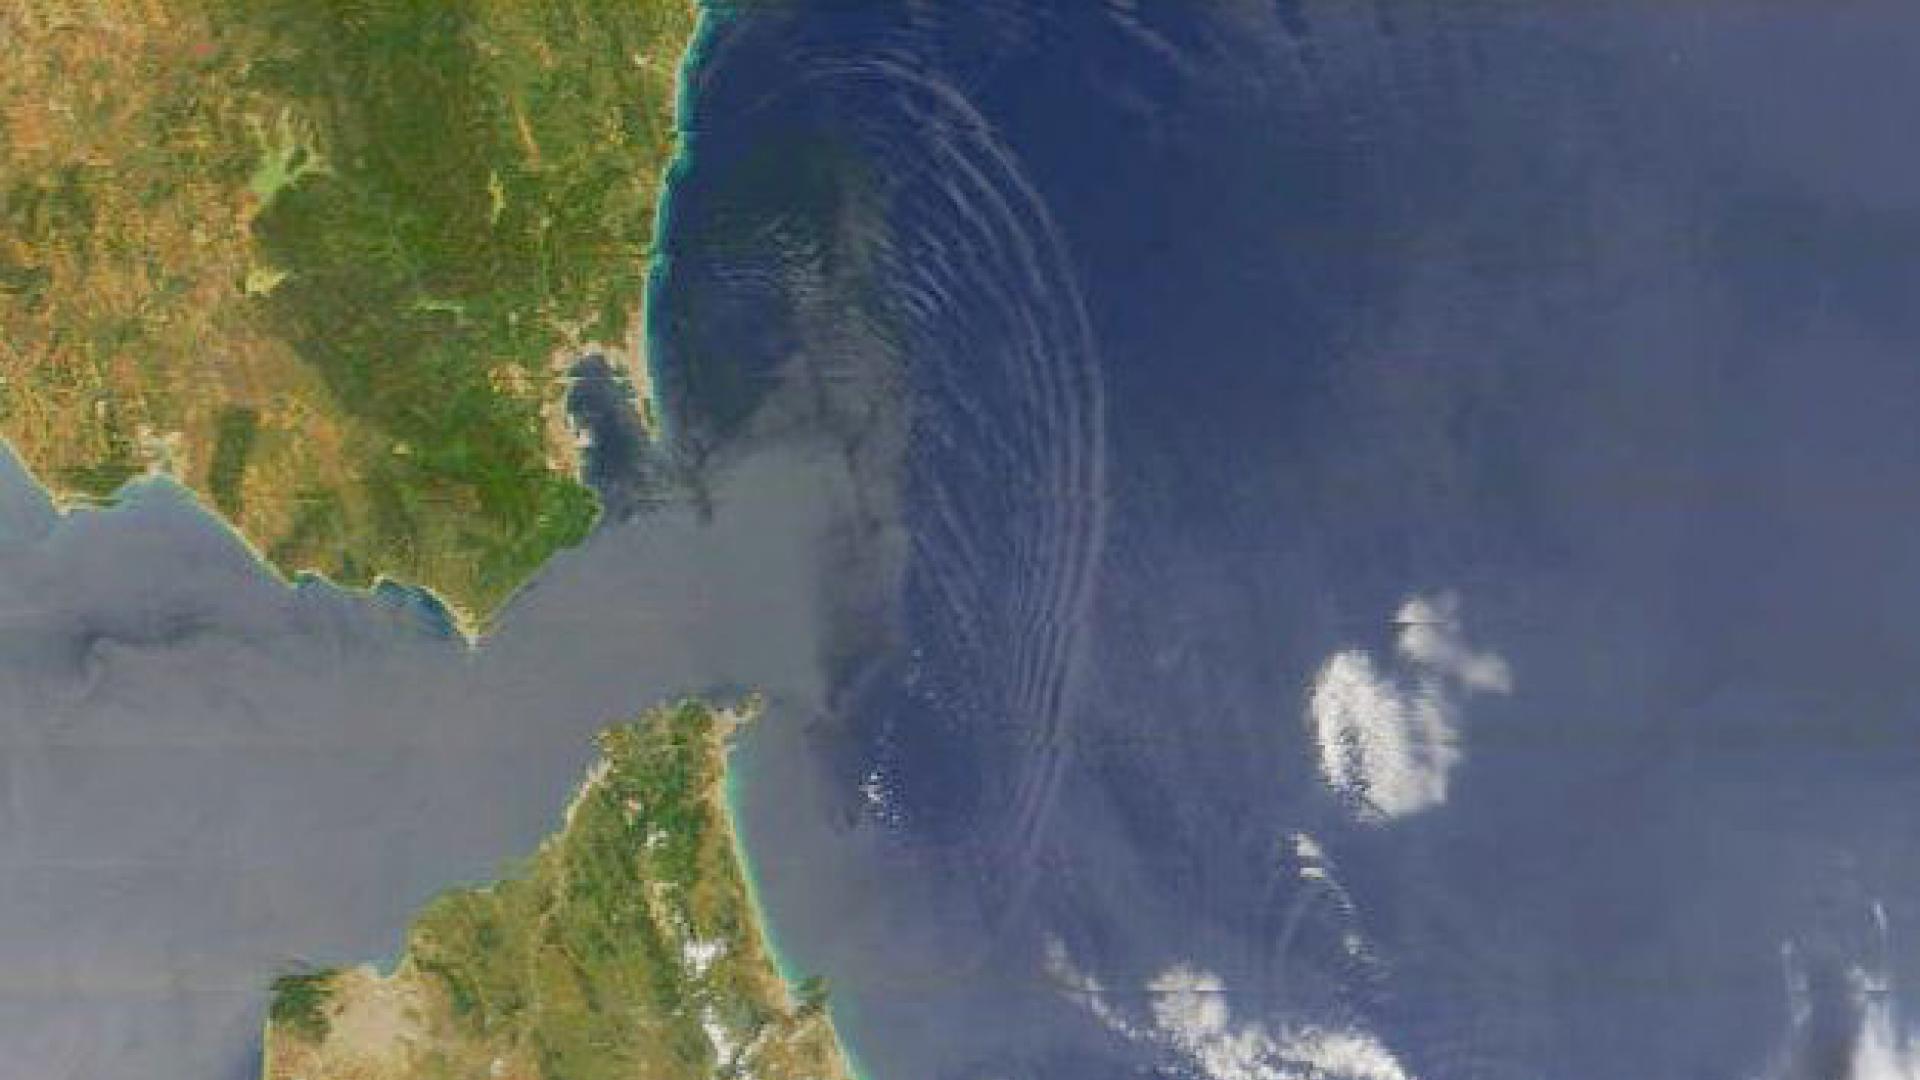 Internal Waves in the Eastern Strait of Gibraltar